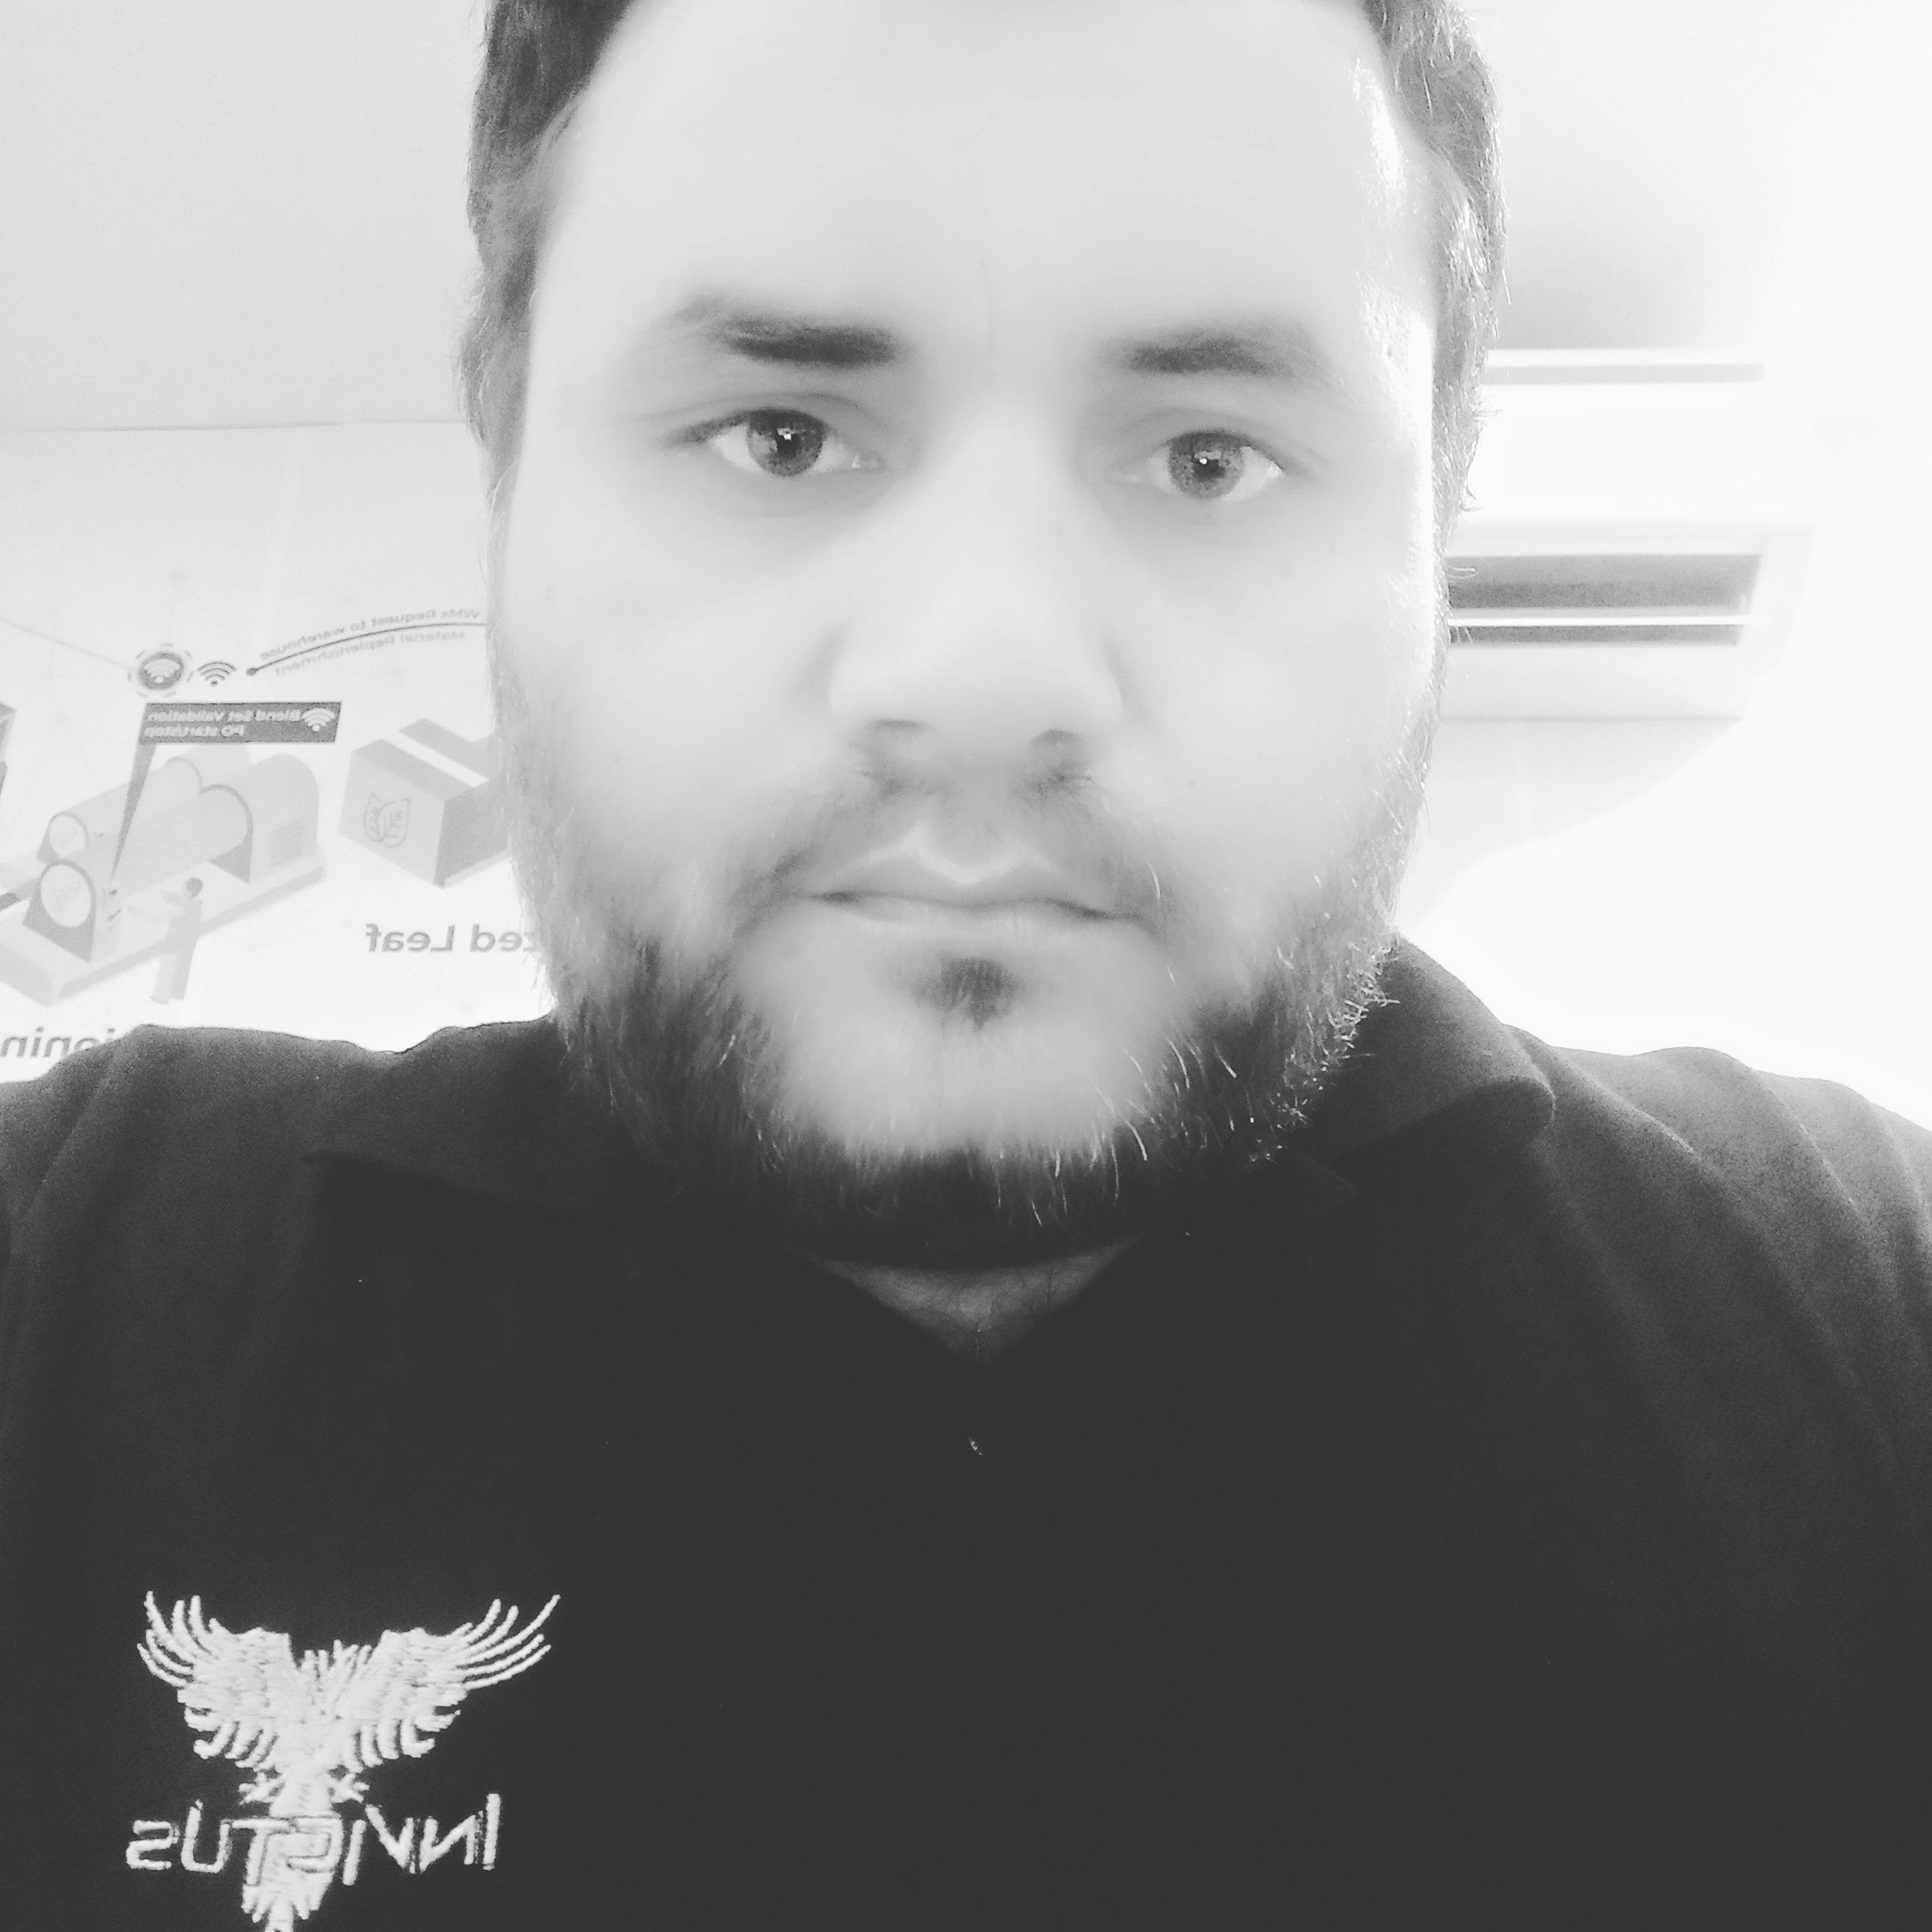 Computer, Statistics, Mathematics Data Entry, Excel, Order Processing, Web Search Freelancer